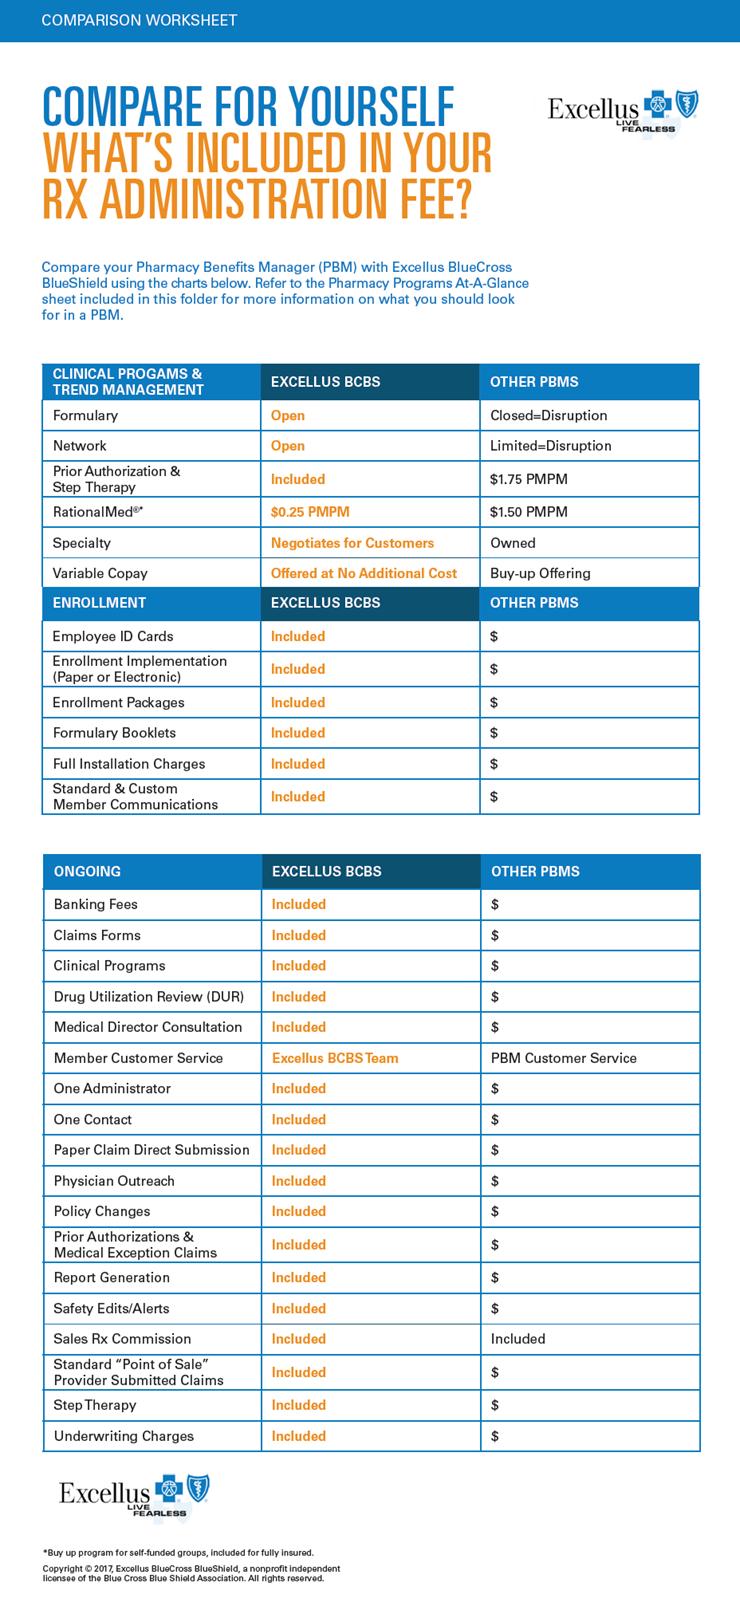 News & Updates | Excellus BlueCross BlueShield